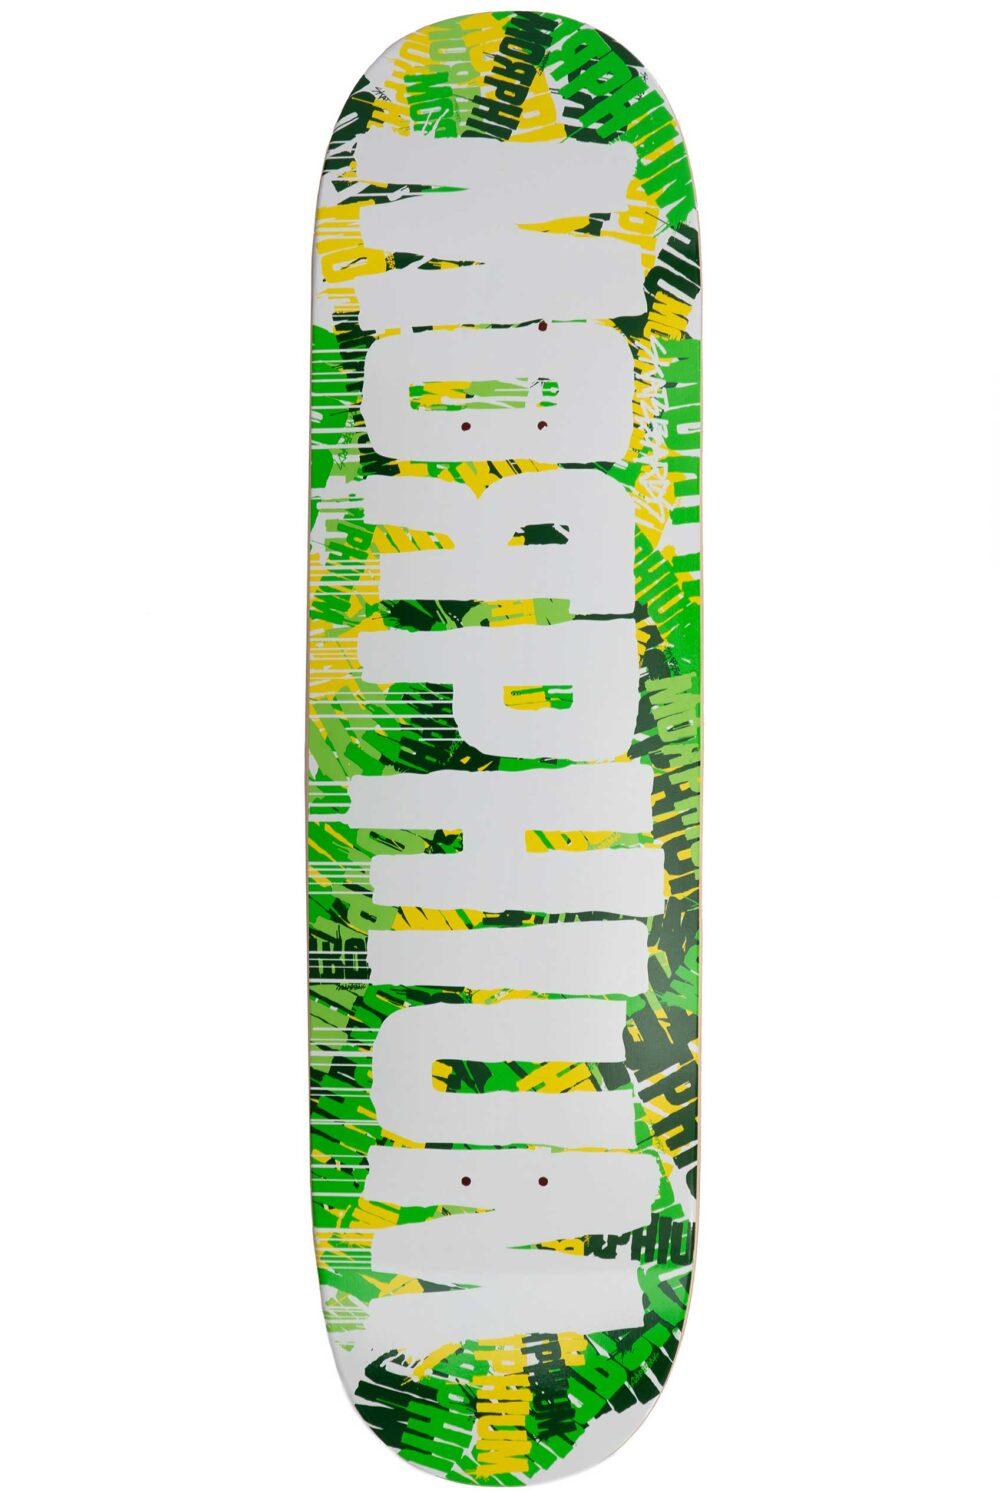 Morphium Skateboards Krink green